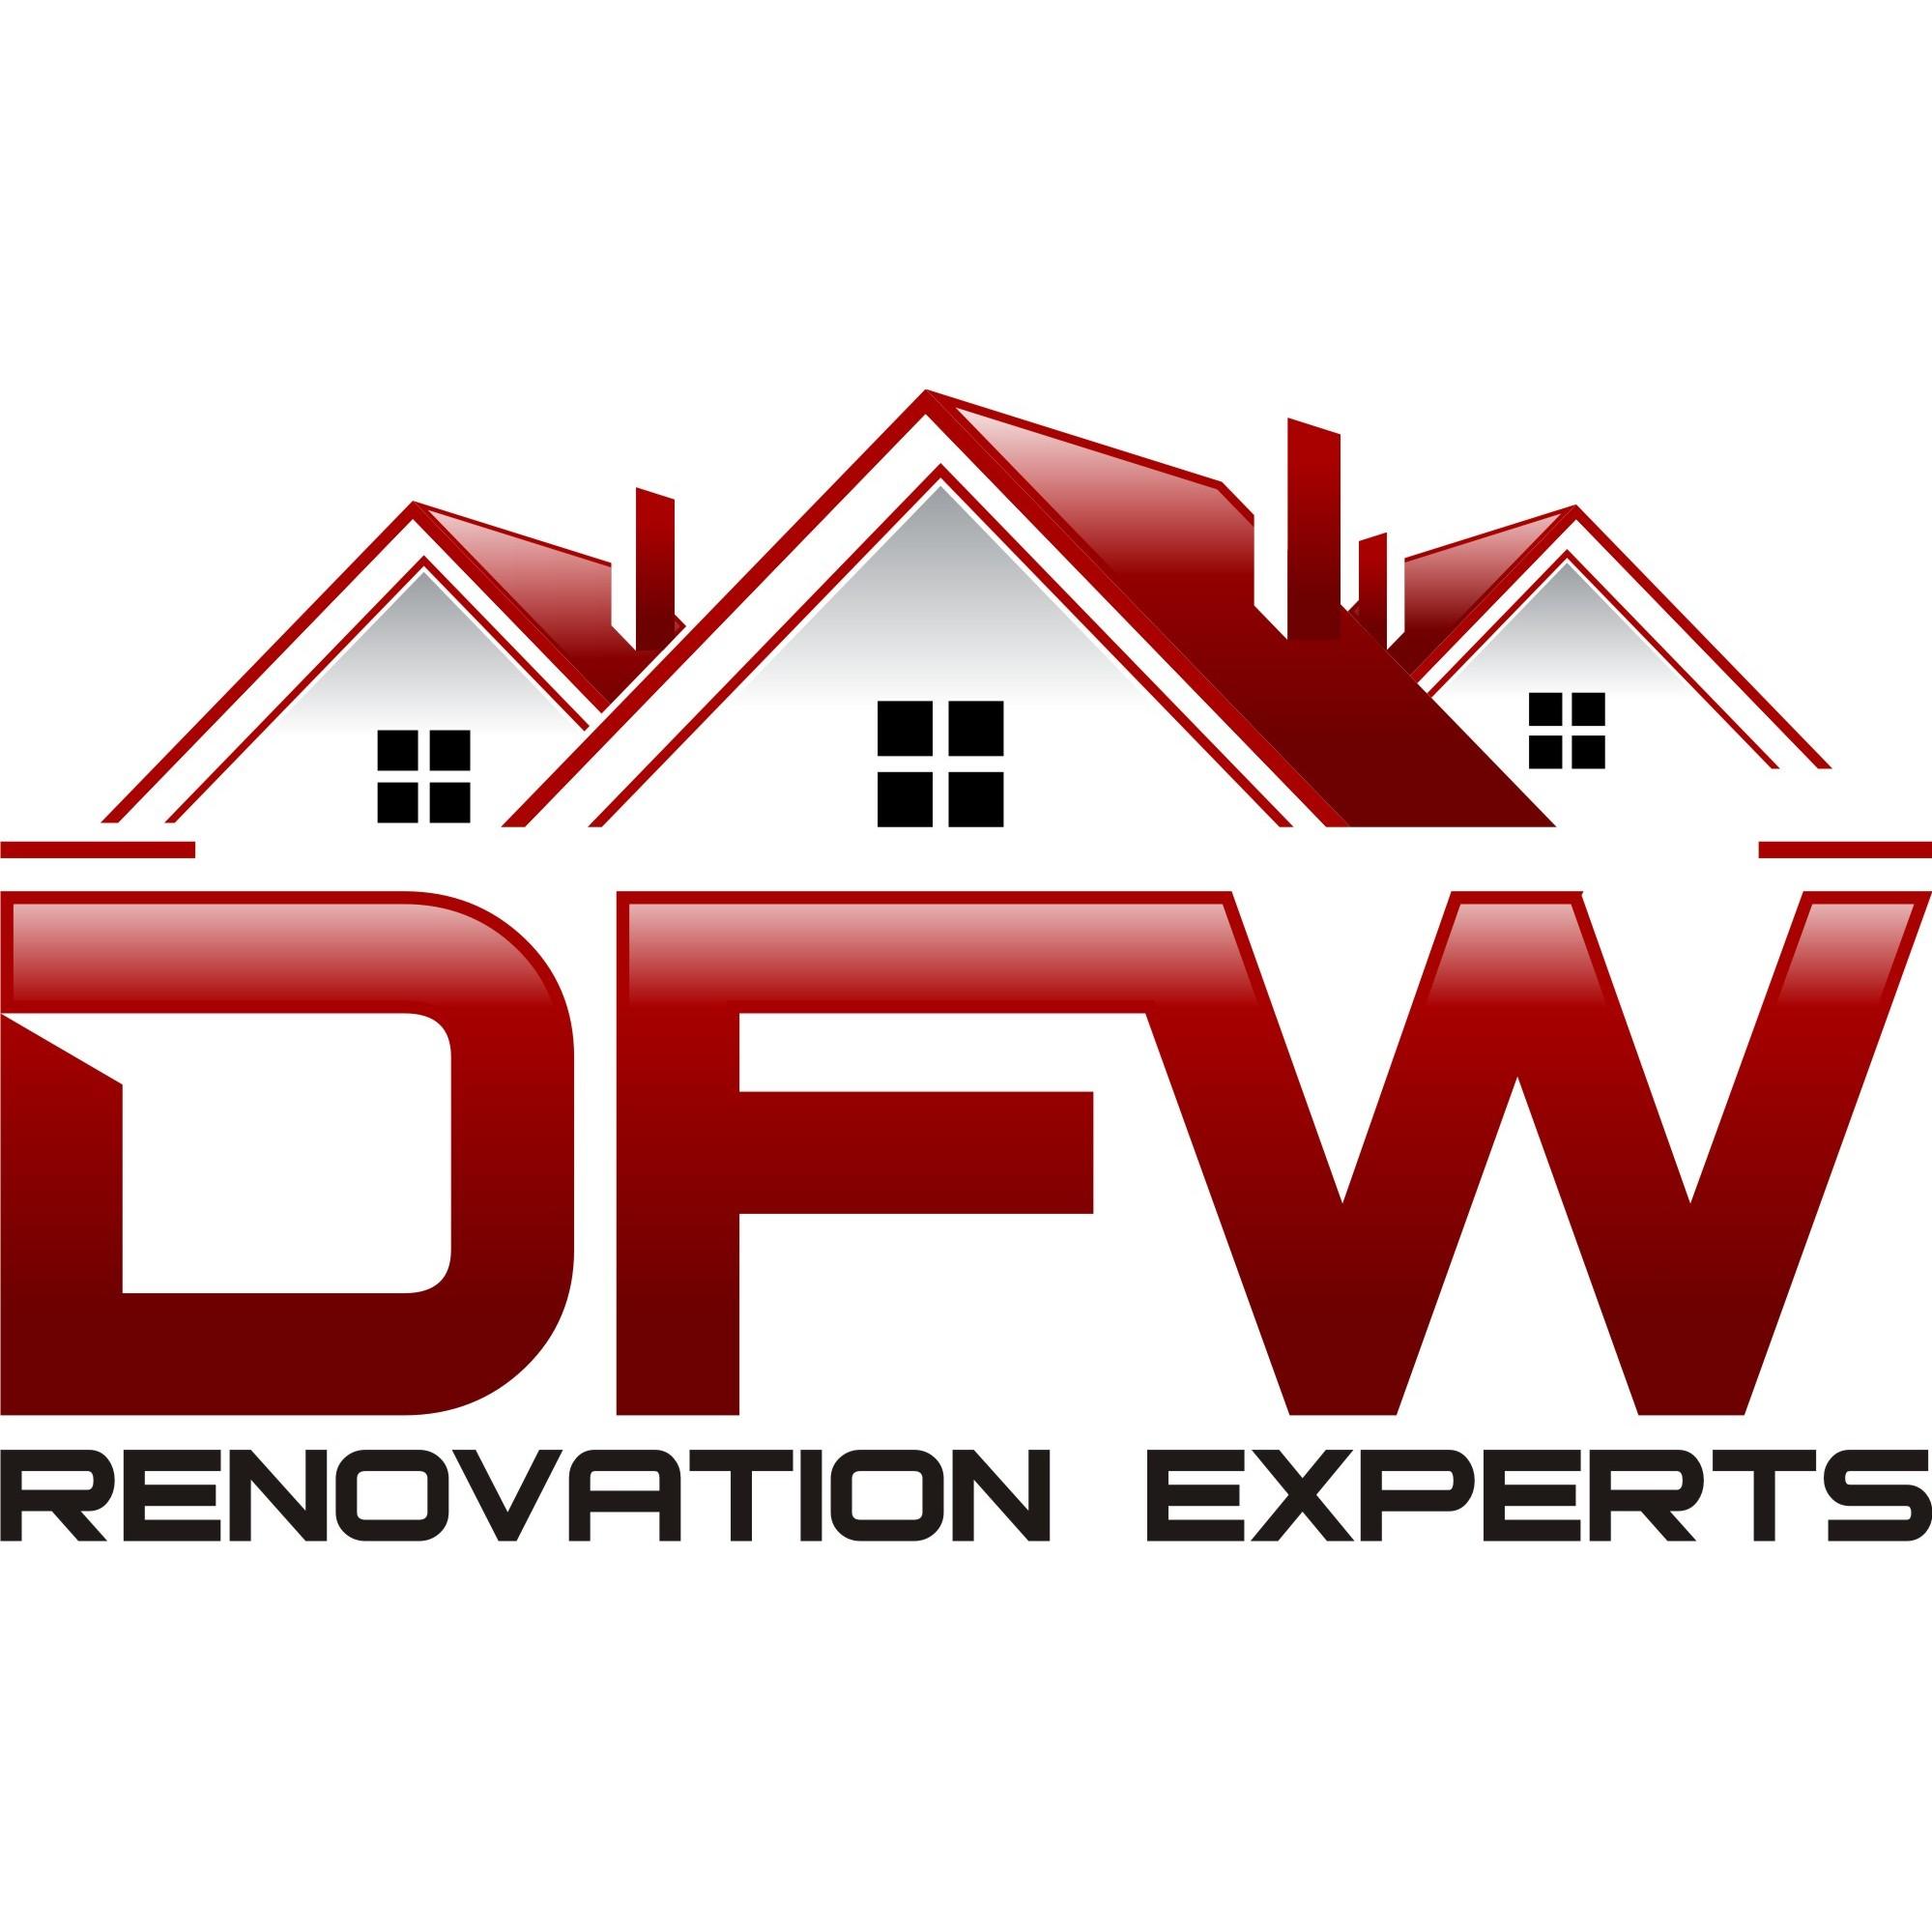 DFW Renovation Experts Logo